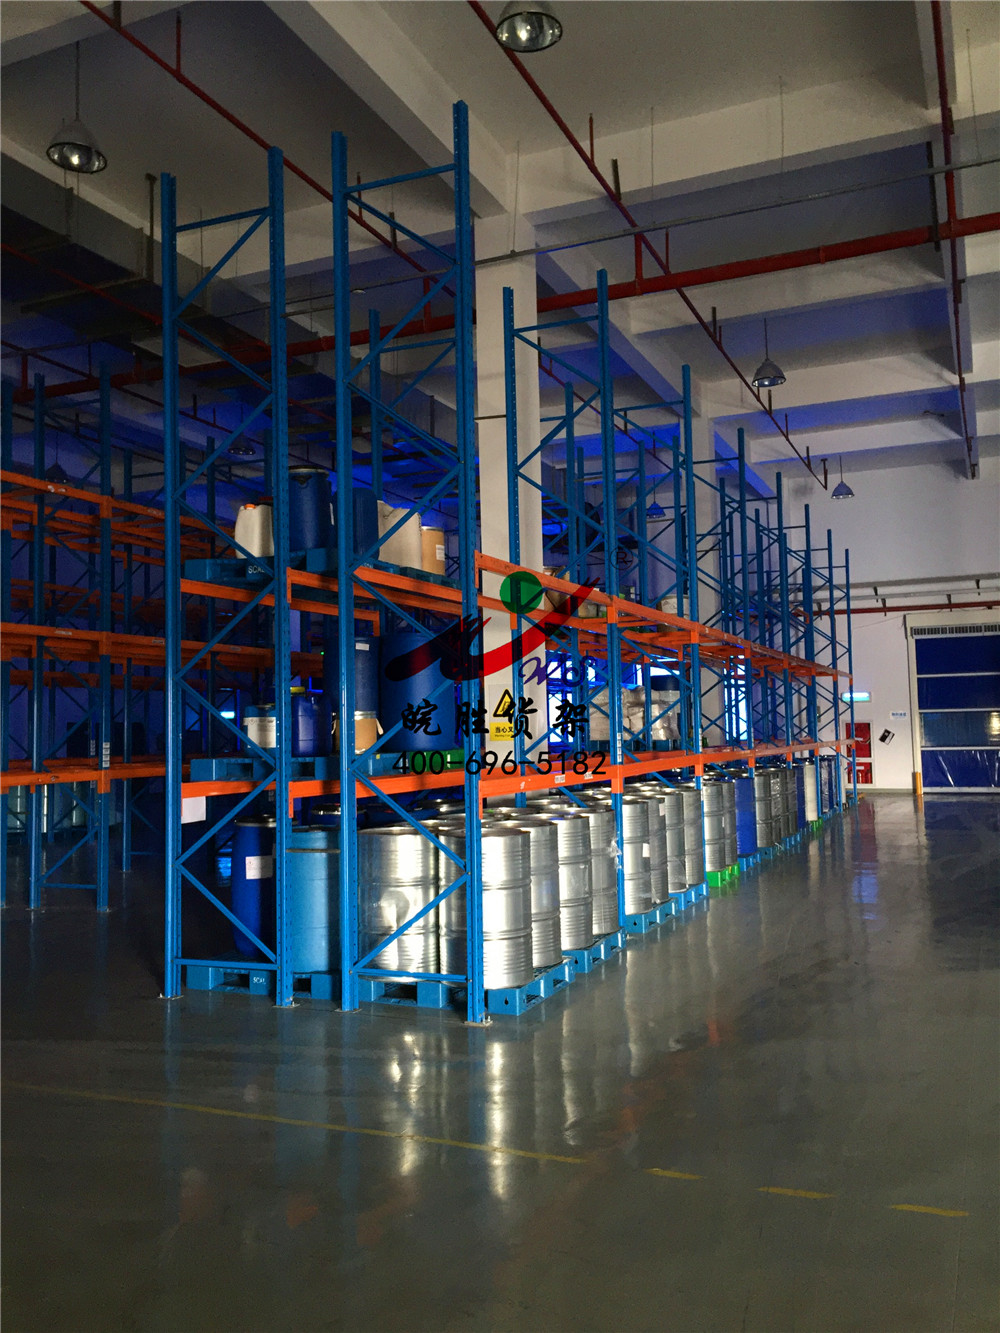 XX日用化学品有限公司 重型货架